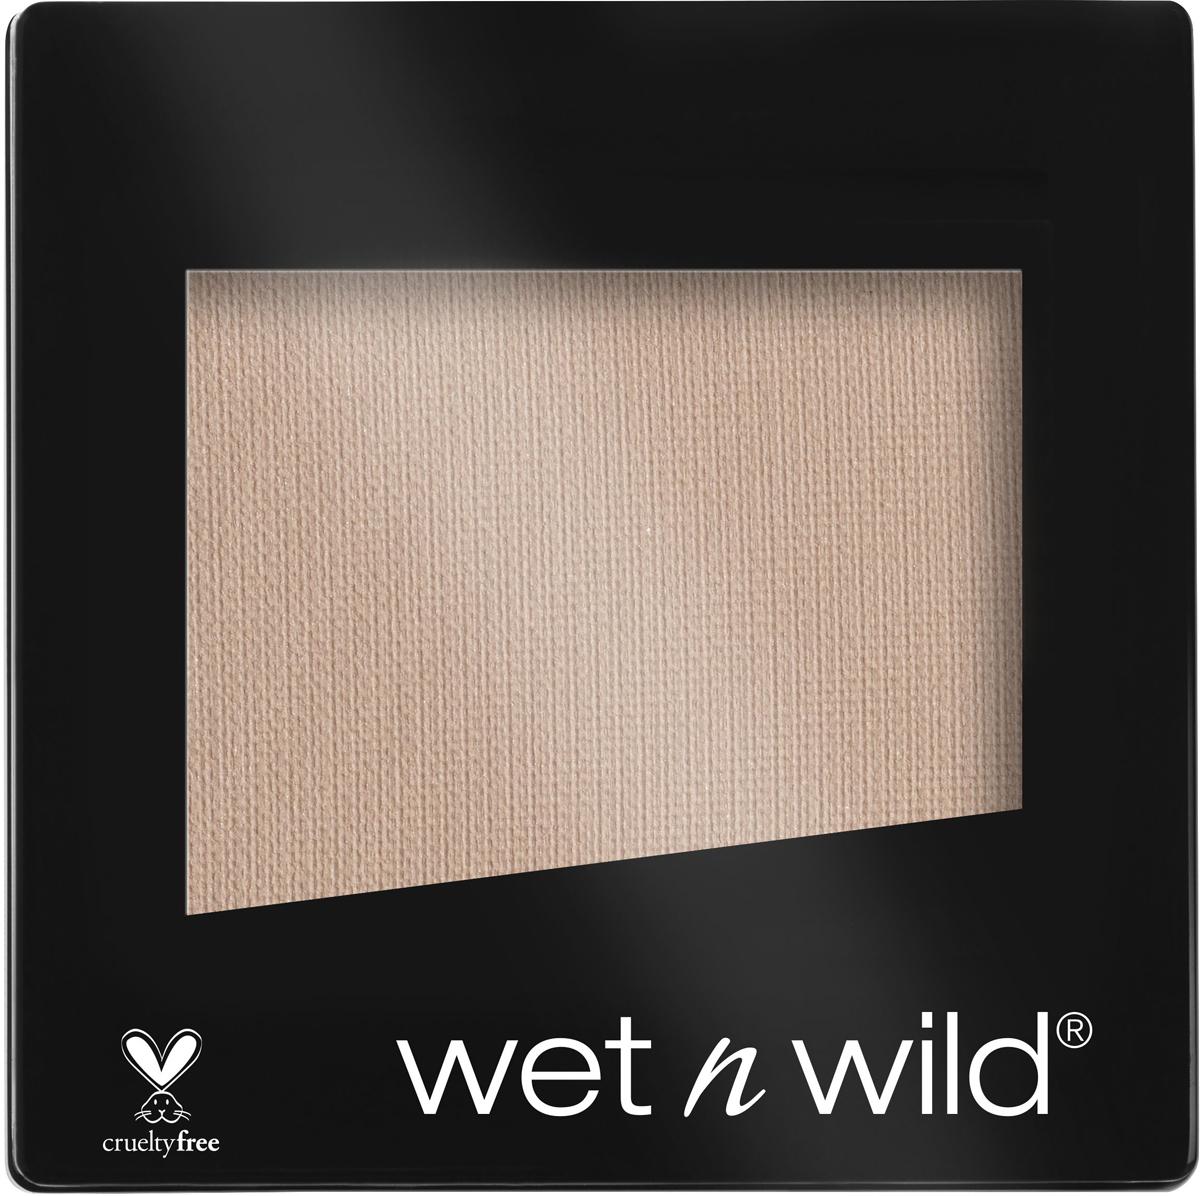 Wet n Wild Тени для век одноцветные Color Icon Eyeshadow Single, тон Brulee, E348a